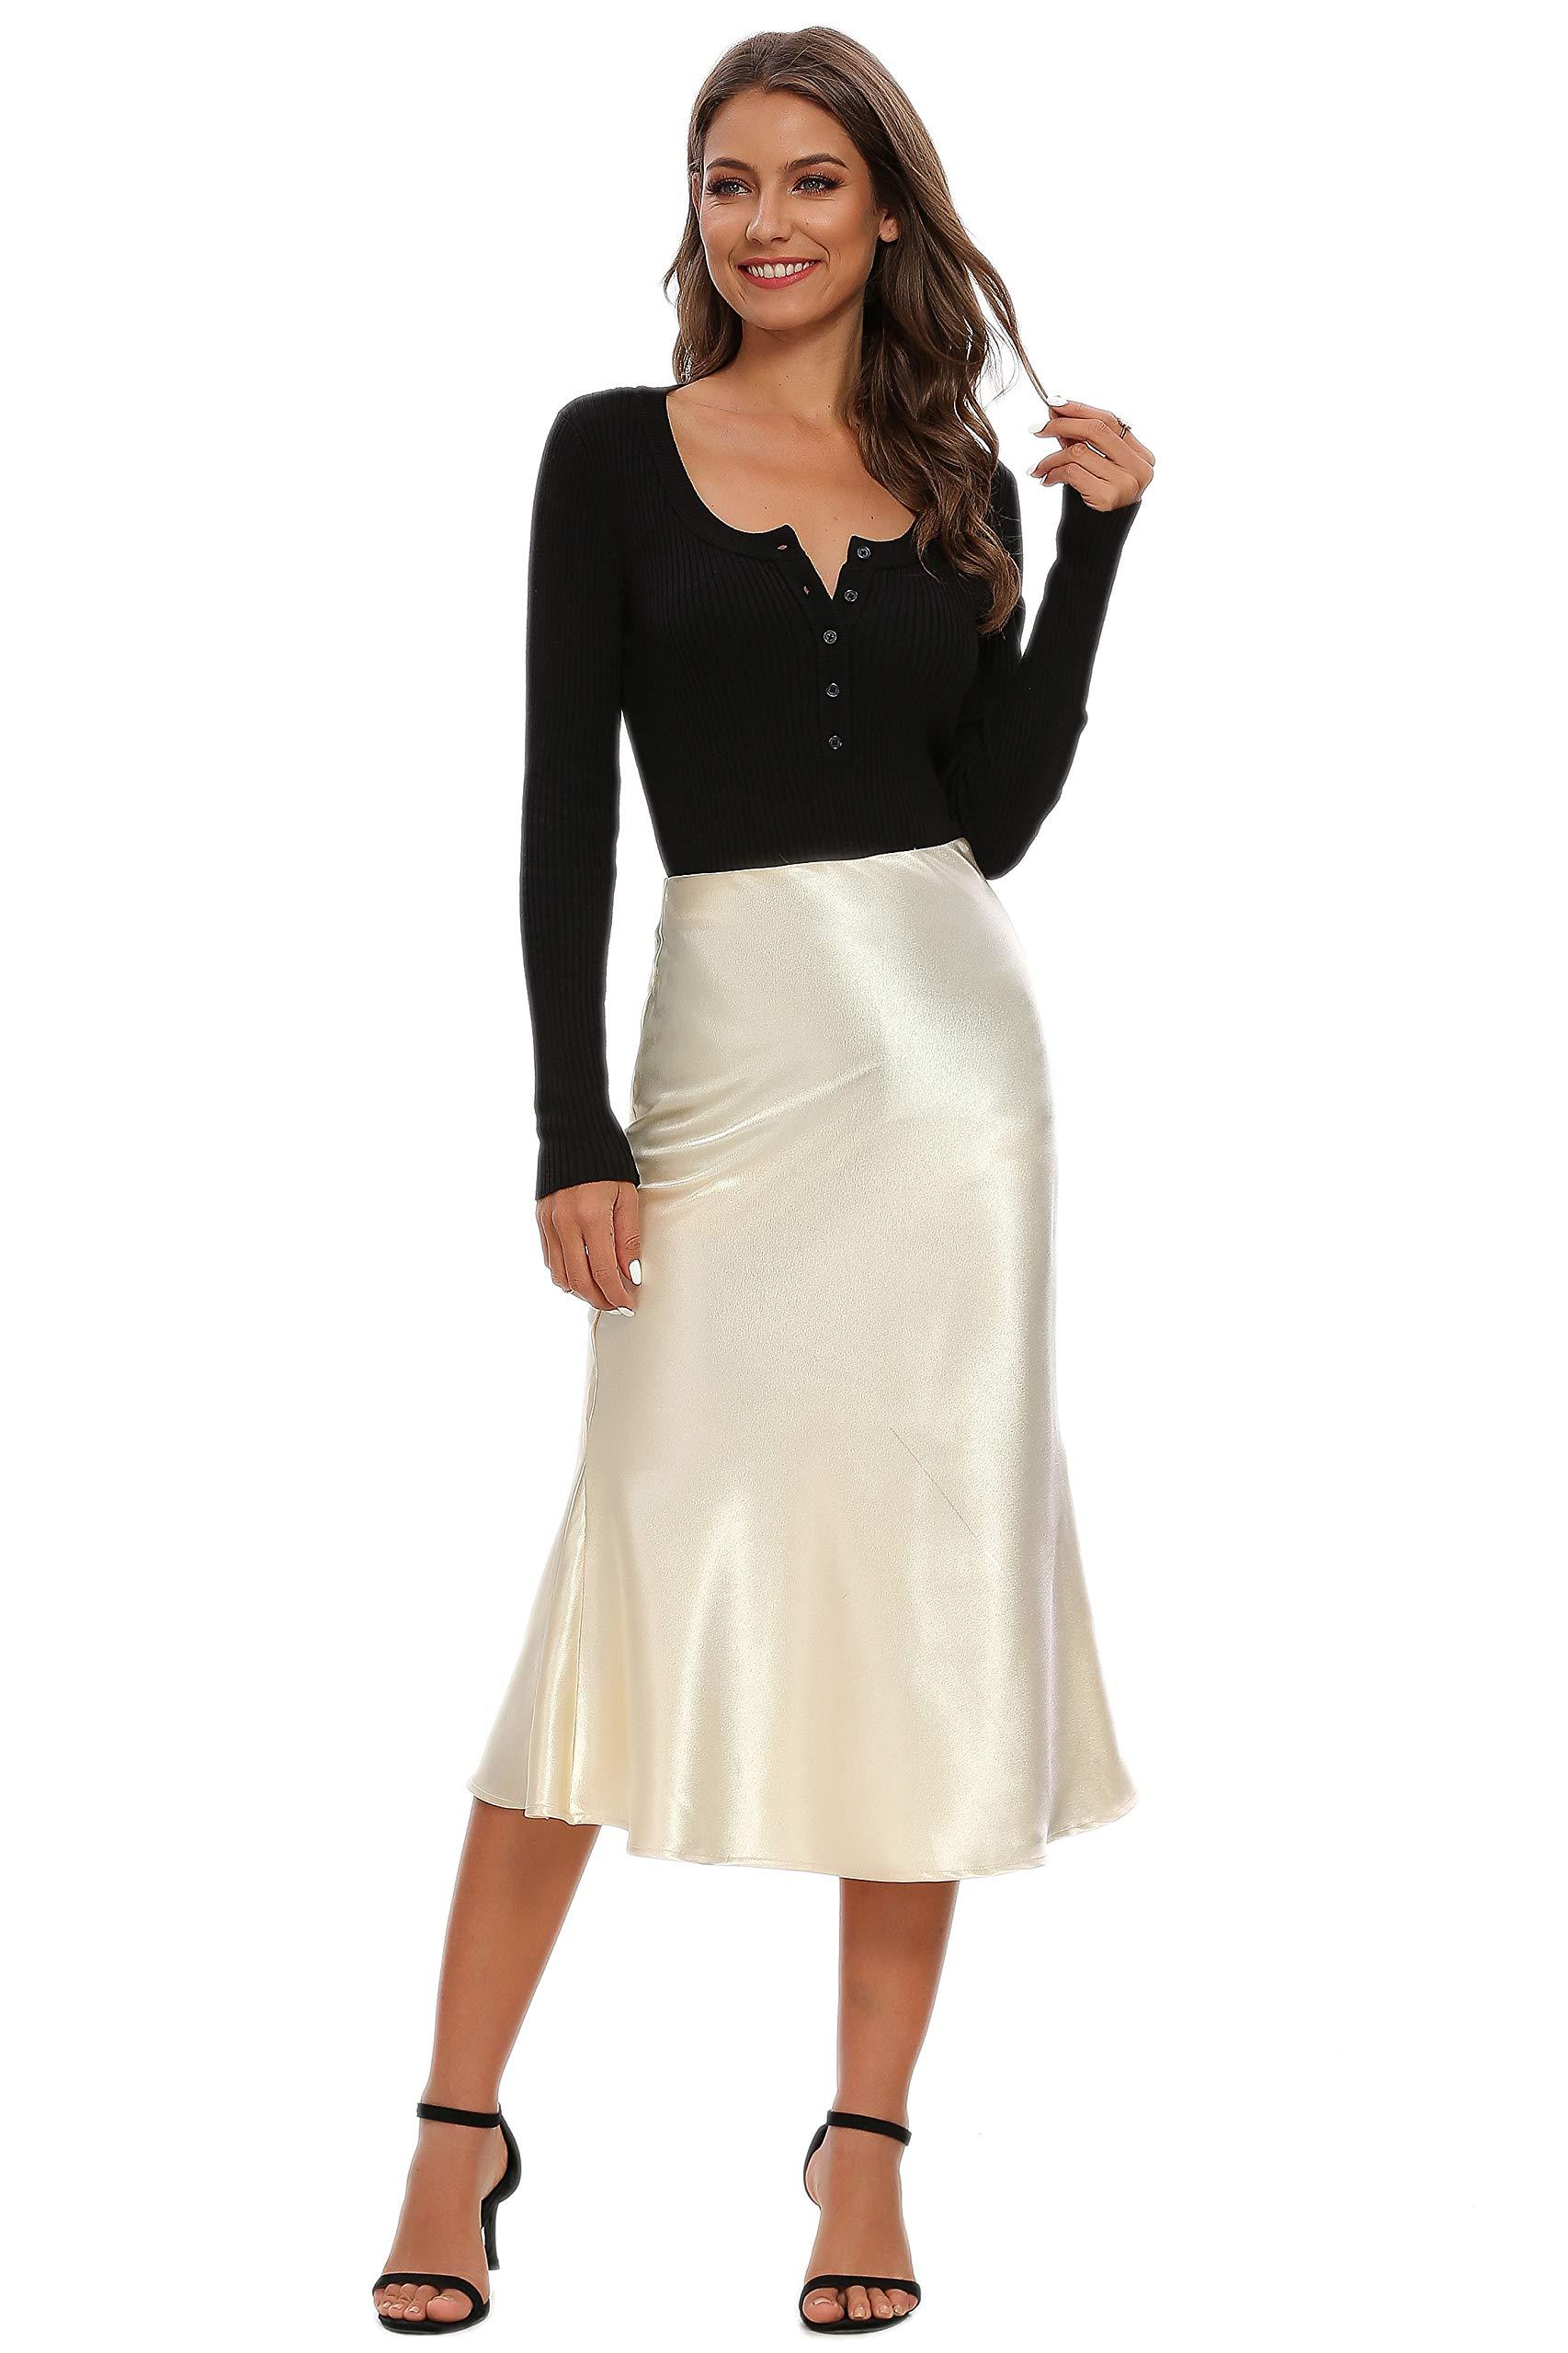 Alcea Rosea Womens High Waist Fishtail Midi Skirt Silk Satin Work Party Pencil Bias Cutting Skirt